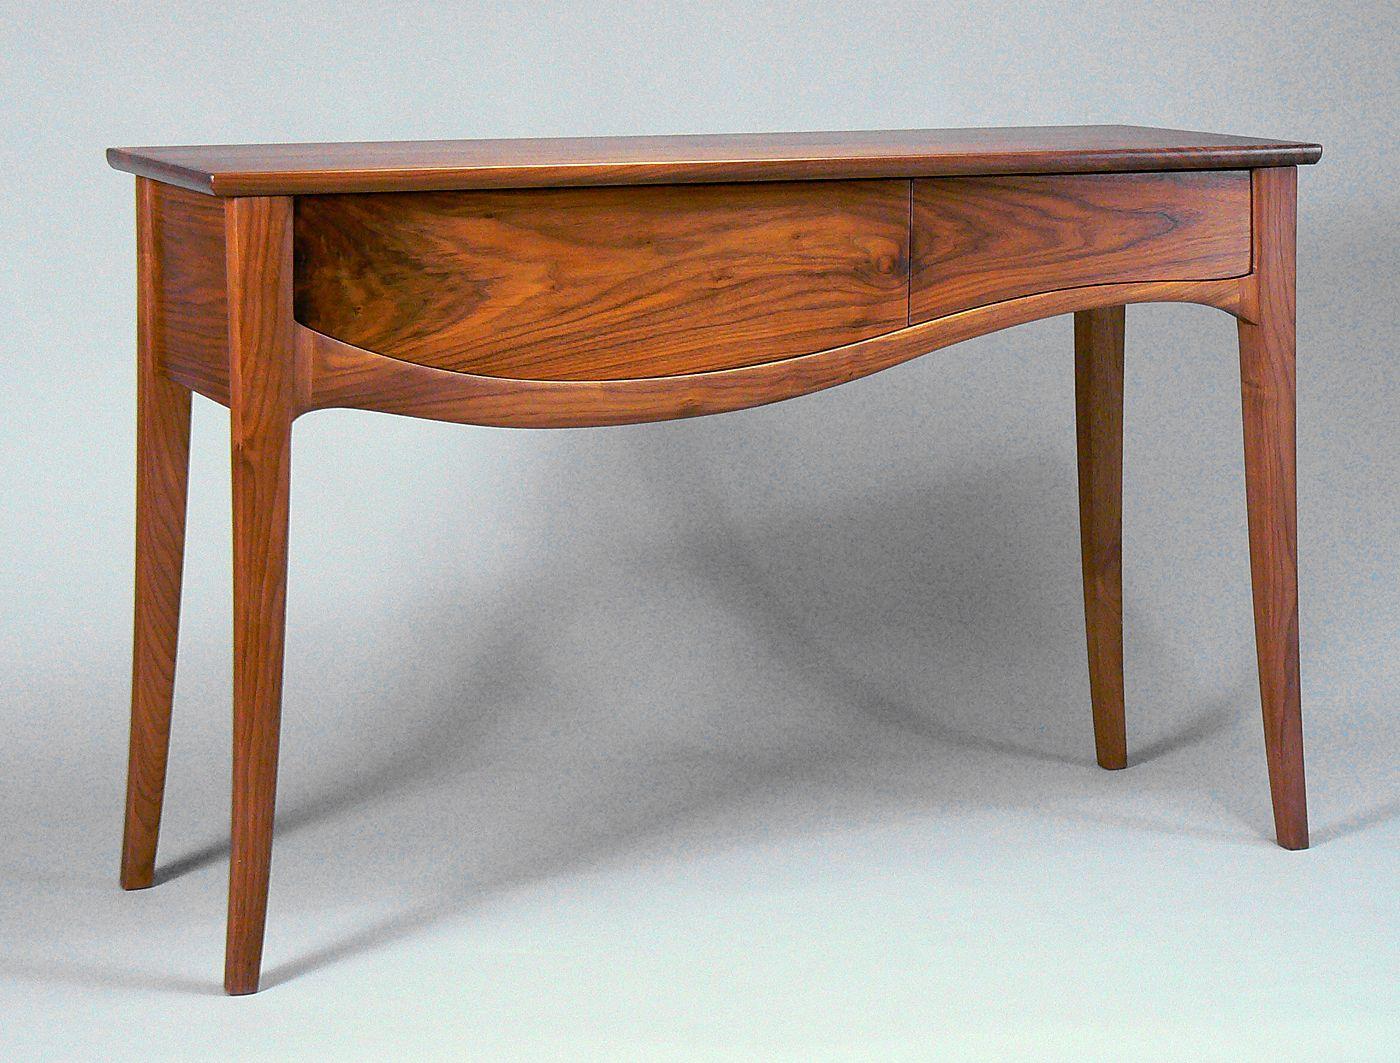 Funky Hall Tables ariel hall table - greg klassen furniture | eire | pinterest